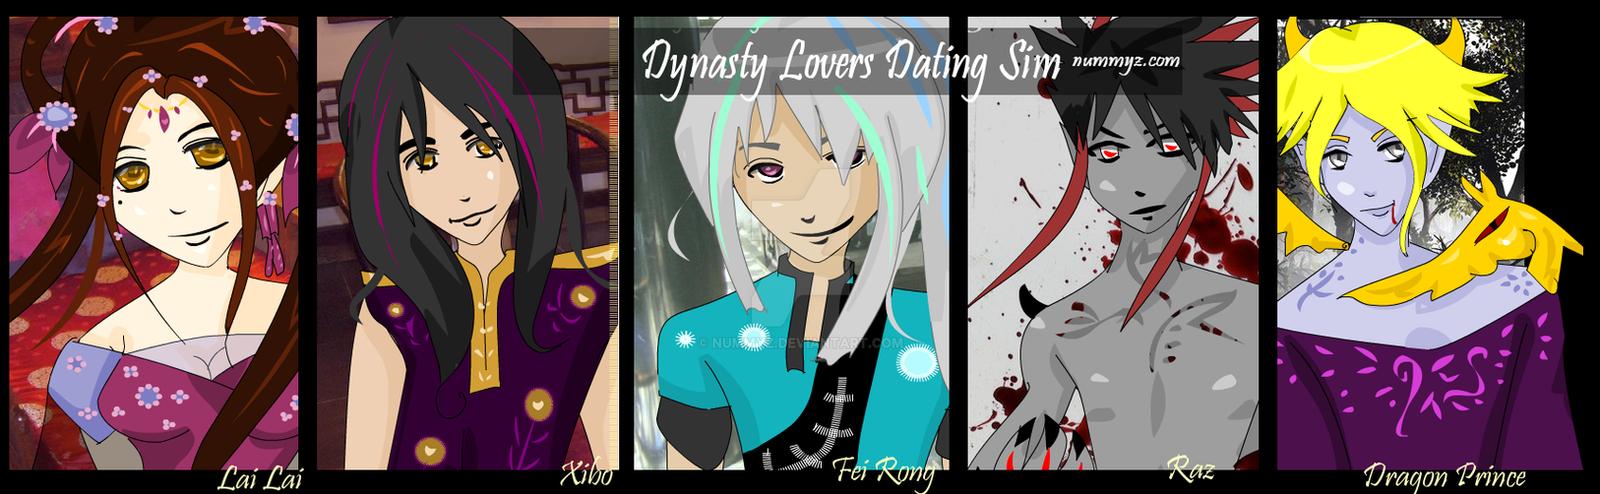 DYNASTY LOVERS Dating Sim RPG by nummyz